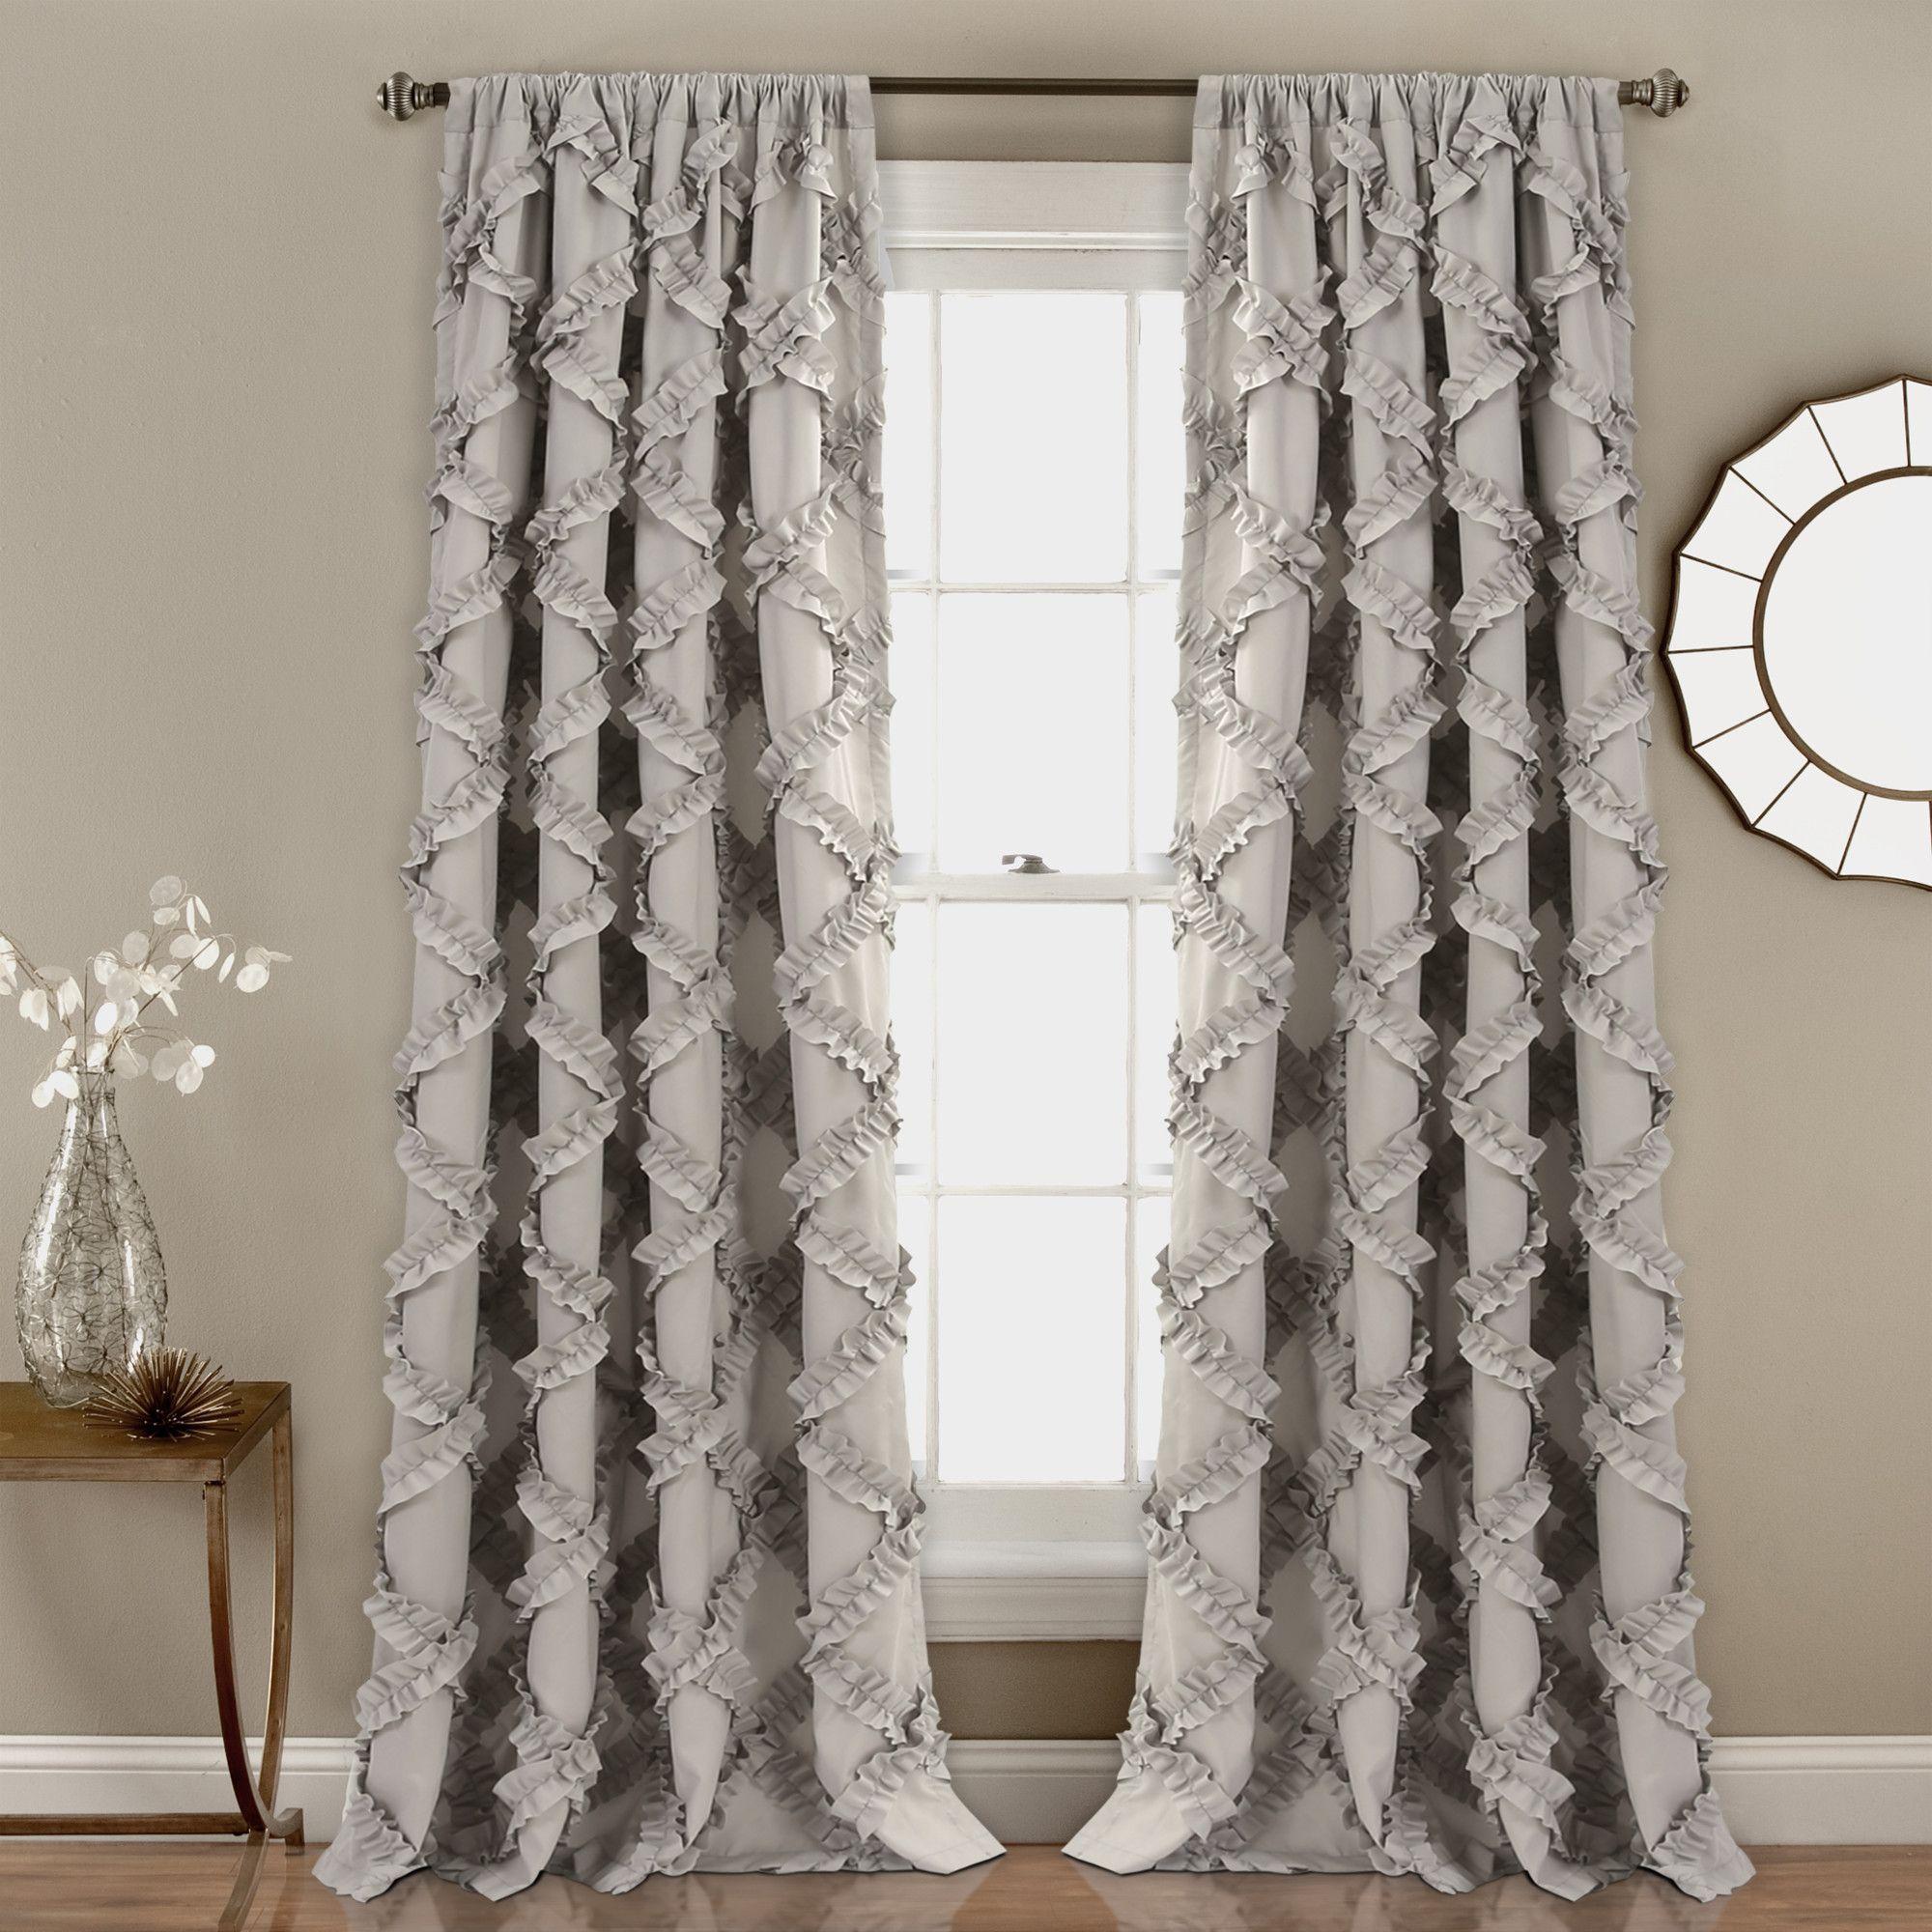 2 window bedroom ideas  ruffle diamond window curtain set in   bedroom decoration